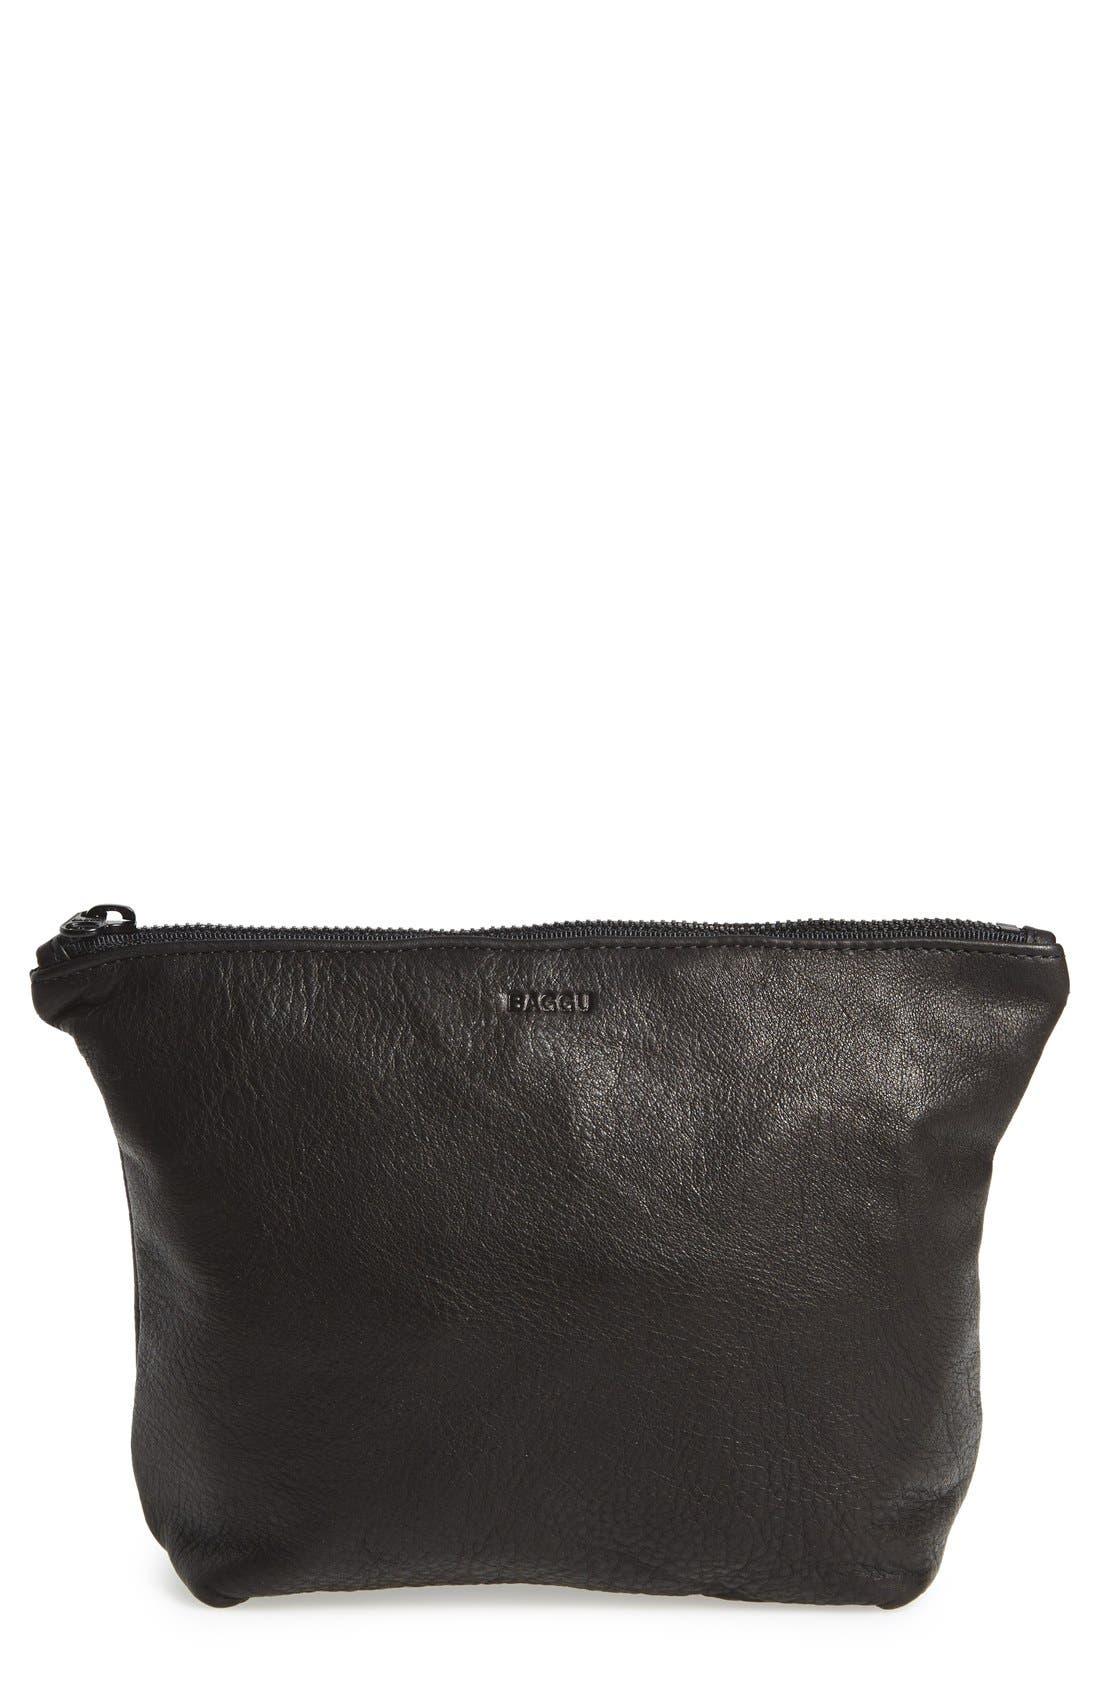 Main Image - Baggu® Medium Leather Zip Pouch